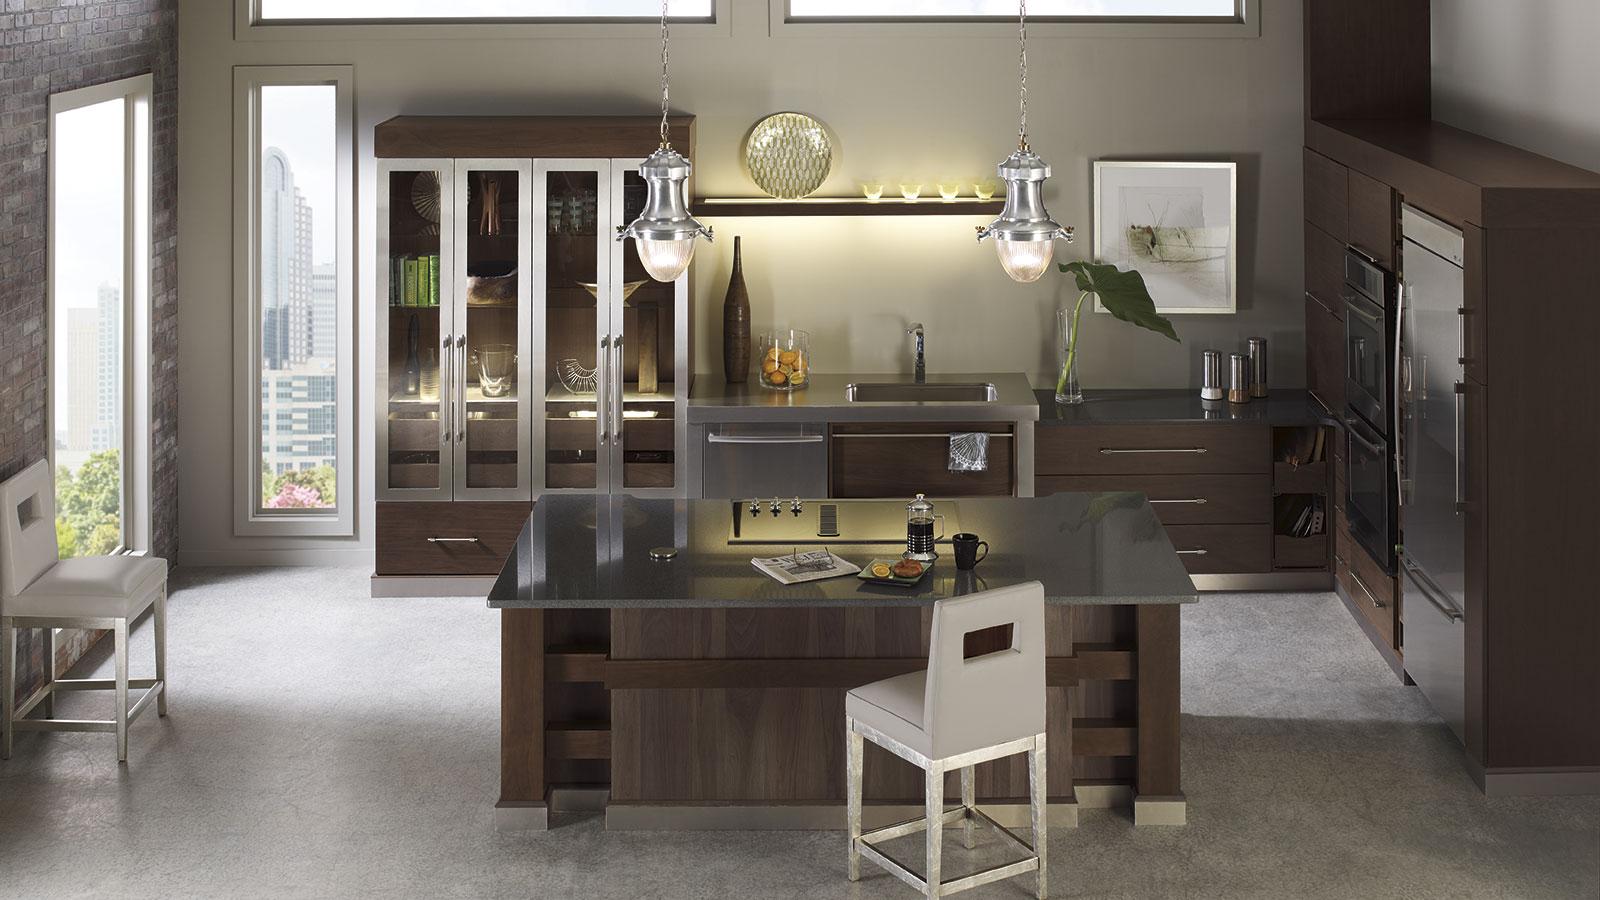 walnut_kitchen_cabinets_large.jpg